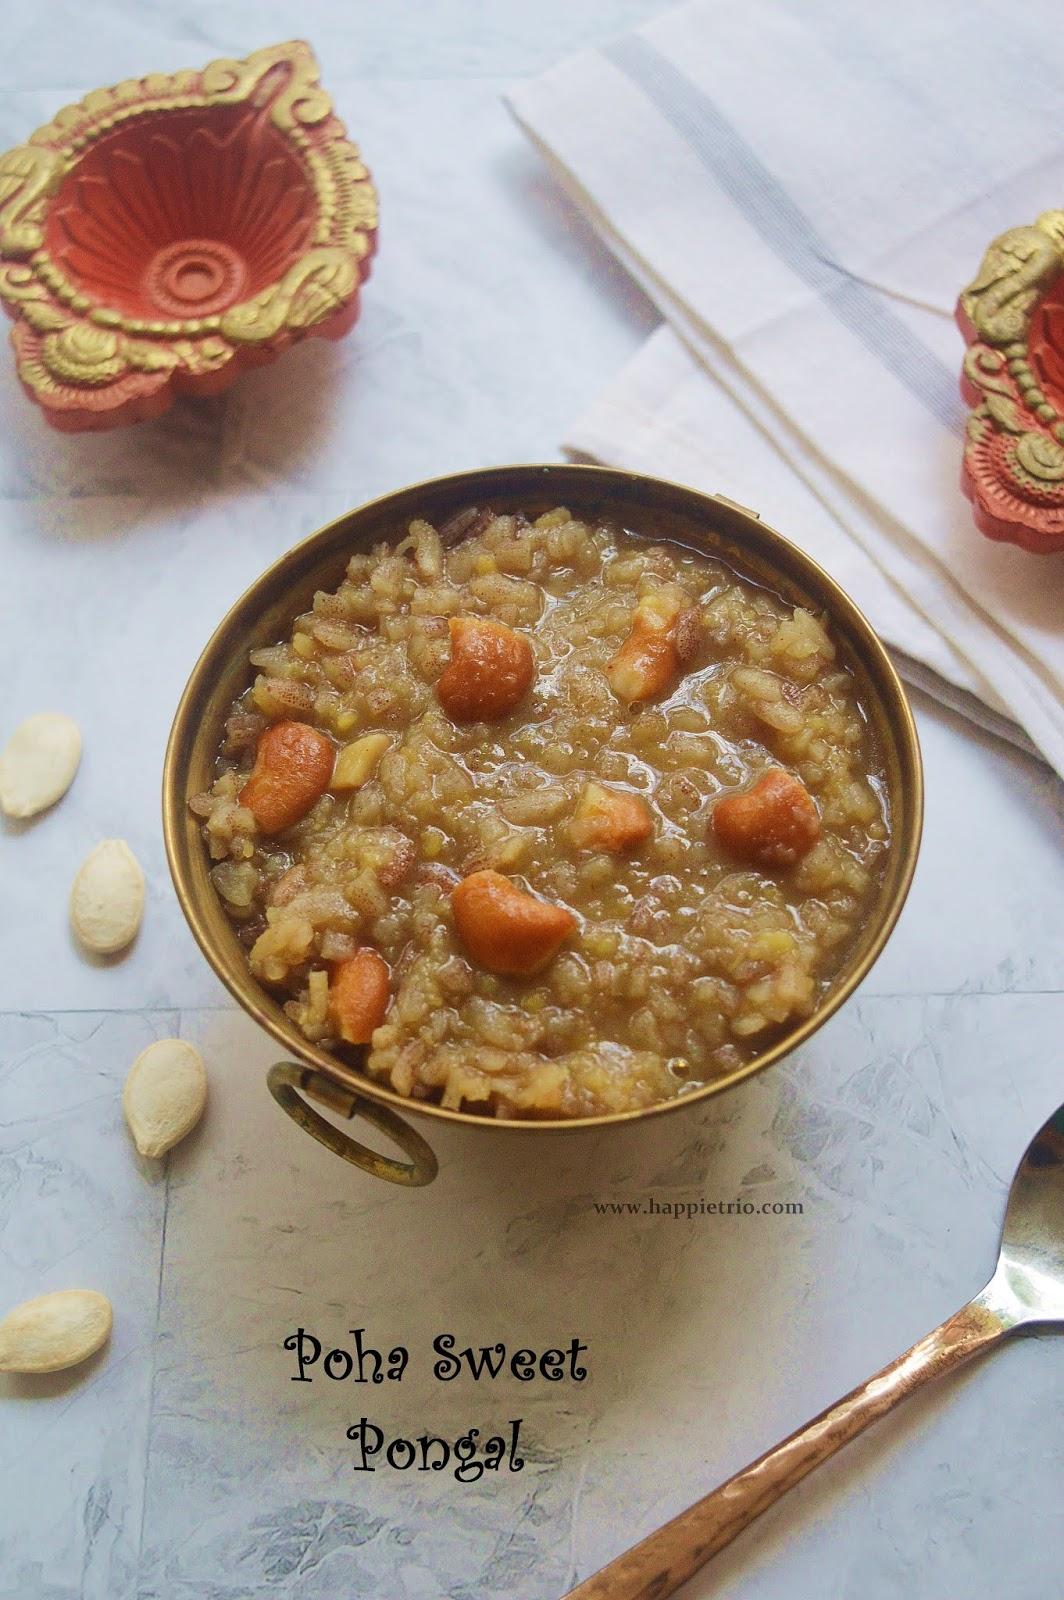 Aval Sakkarai Pongal | Poha Sweet Pongal